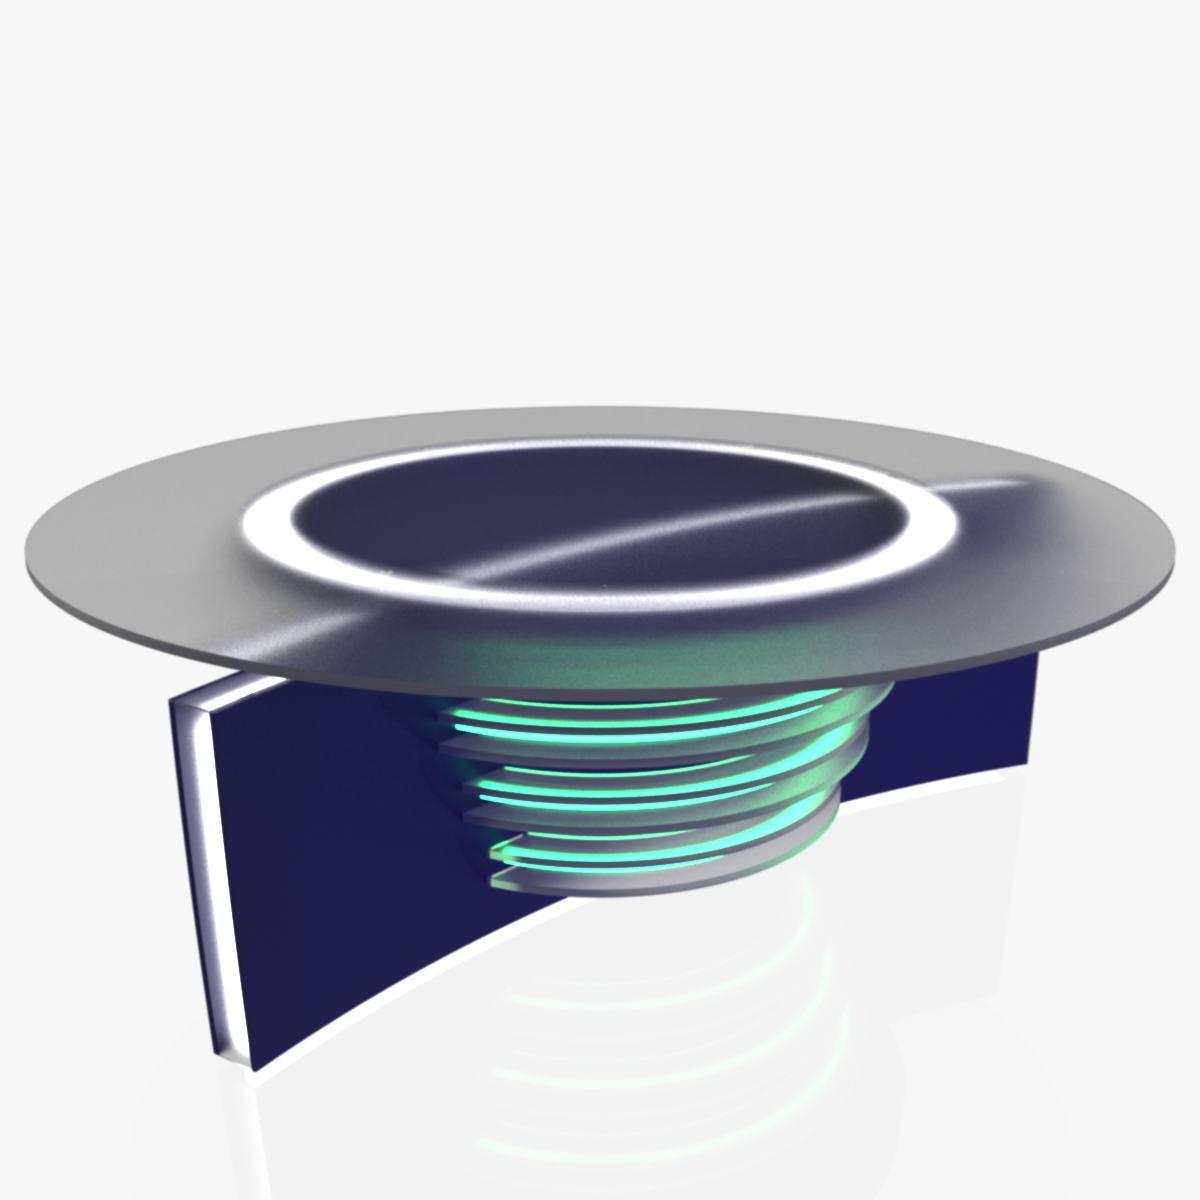 Virtual Home Design Studio: Virtual Tv Studio News Desk 6 3D Model